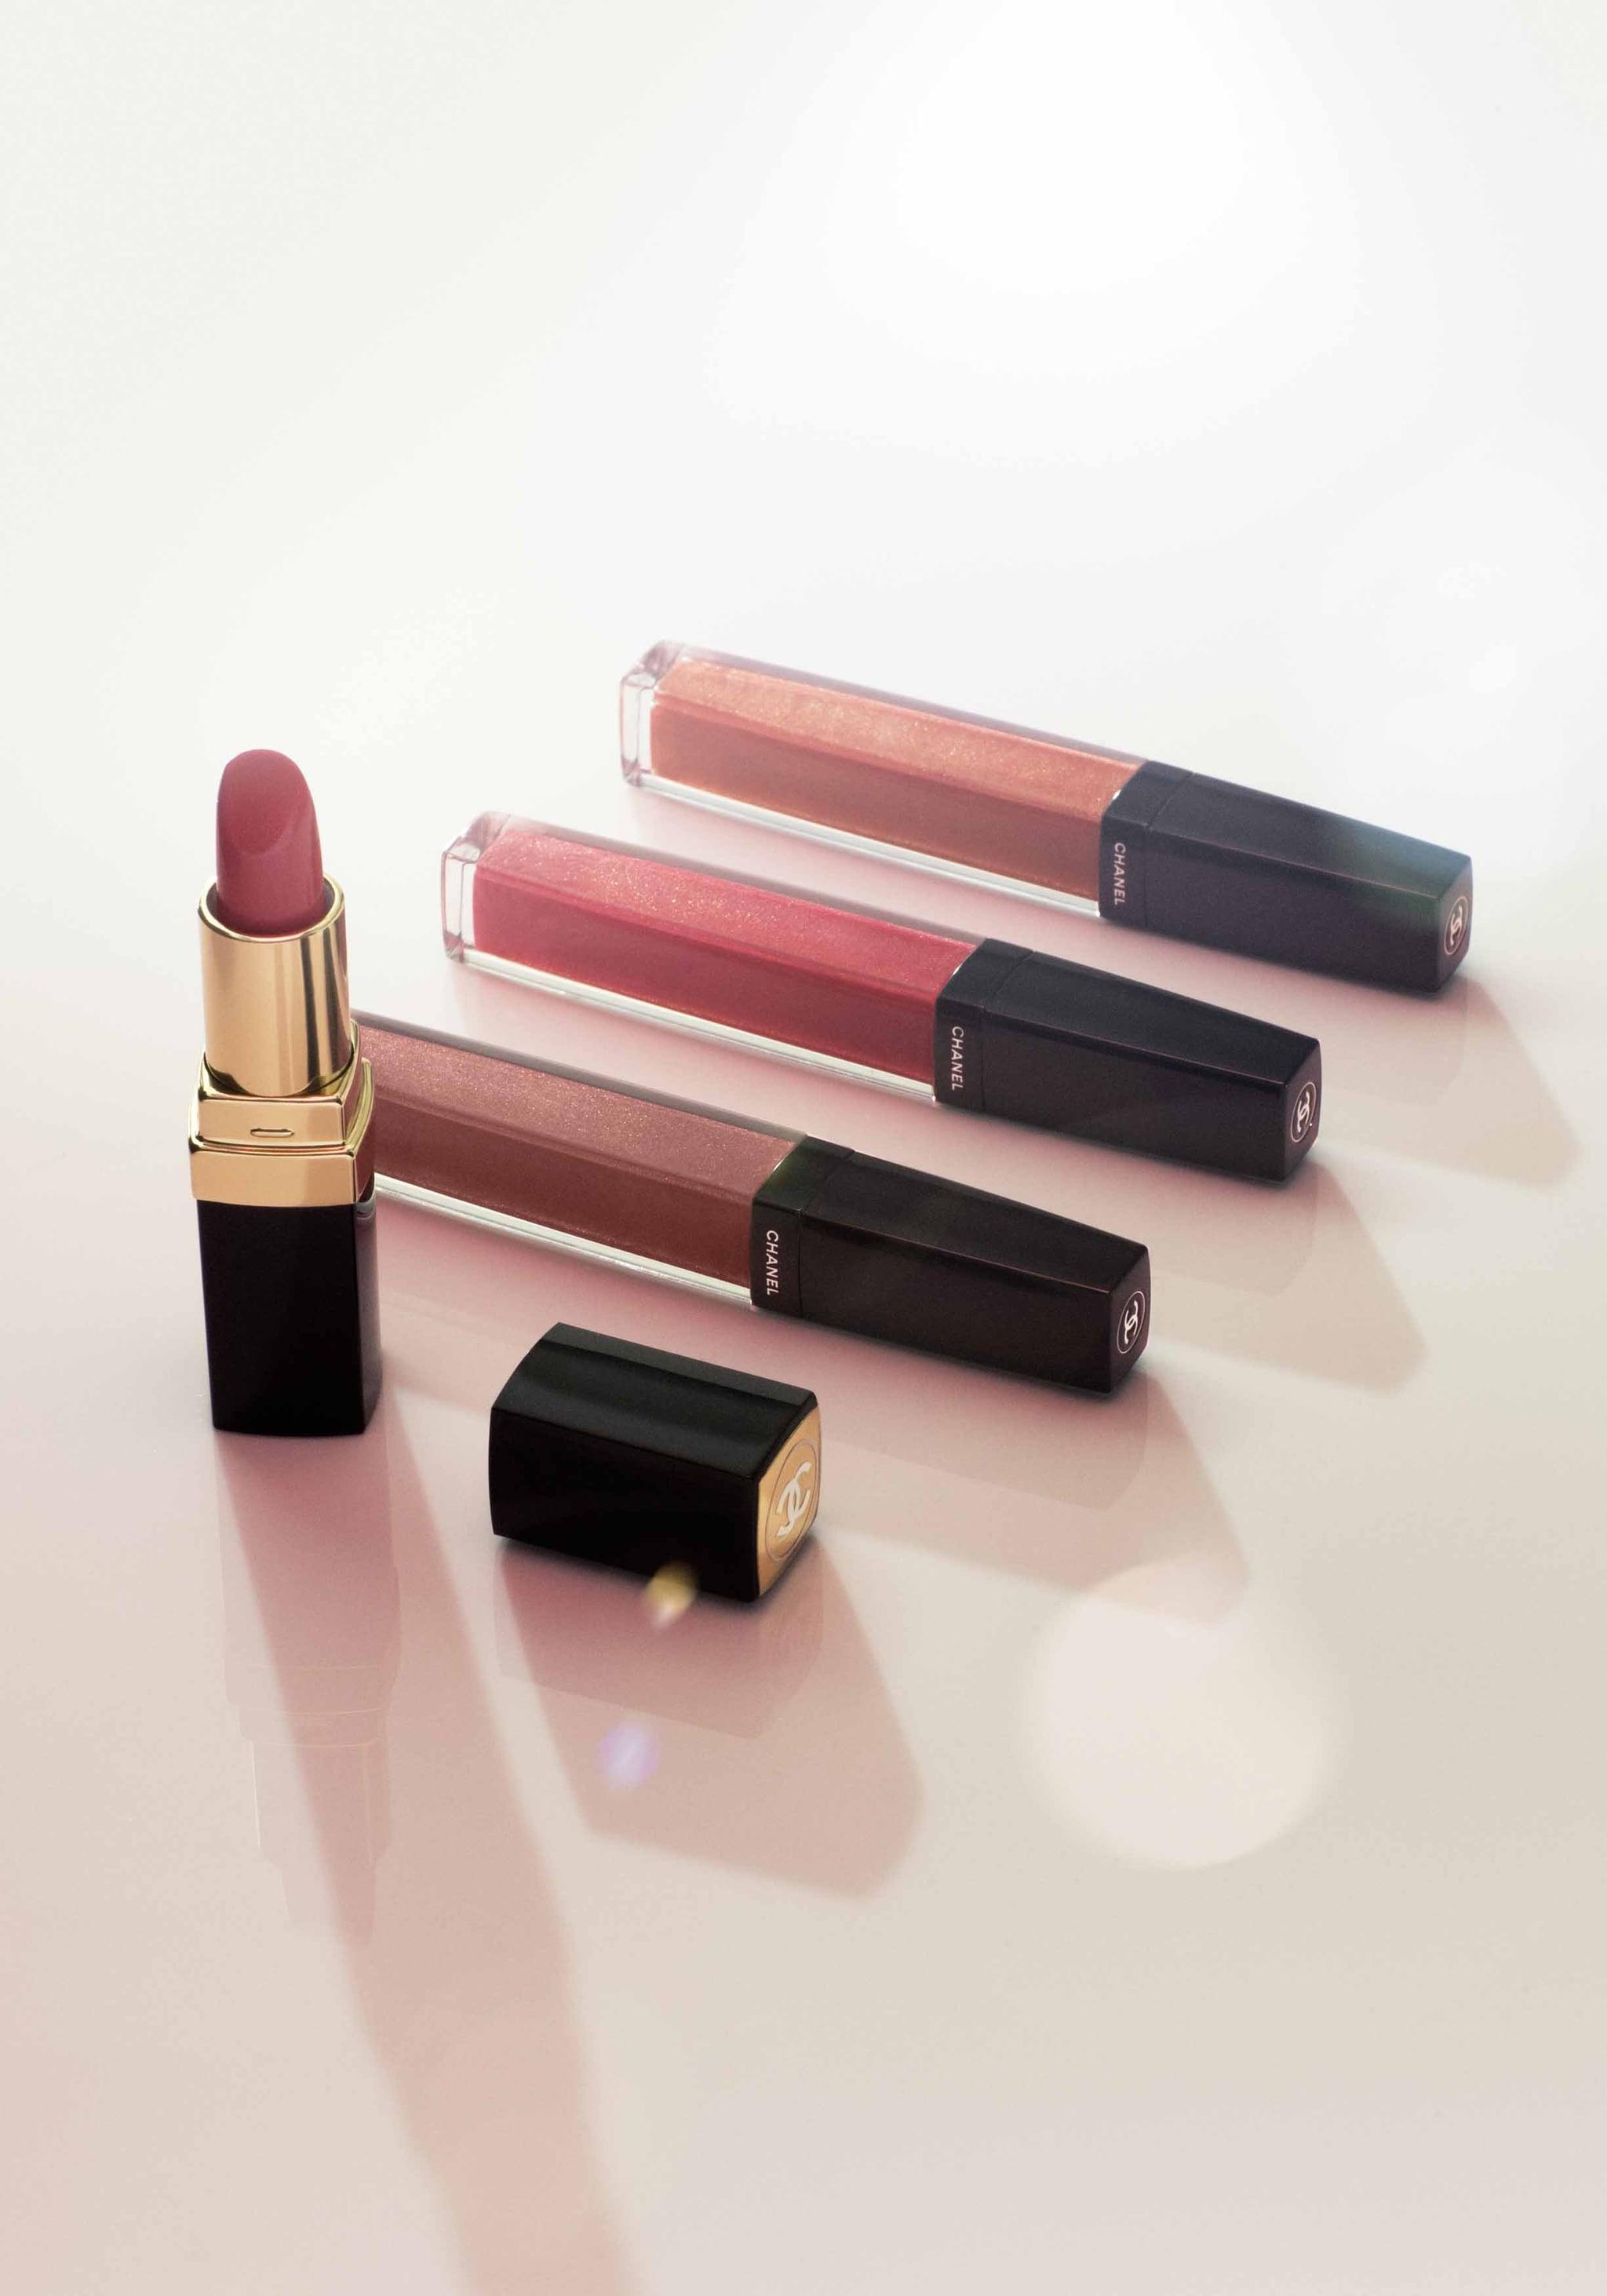 Aqualumière glosses and lipsticks